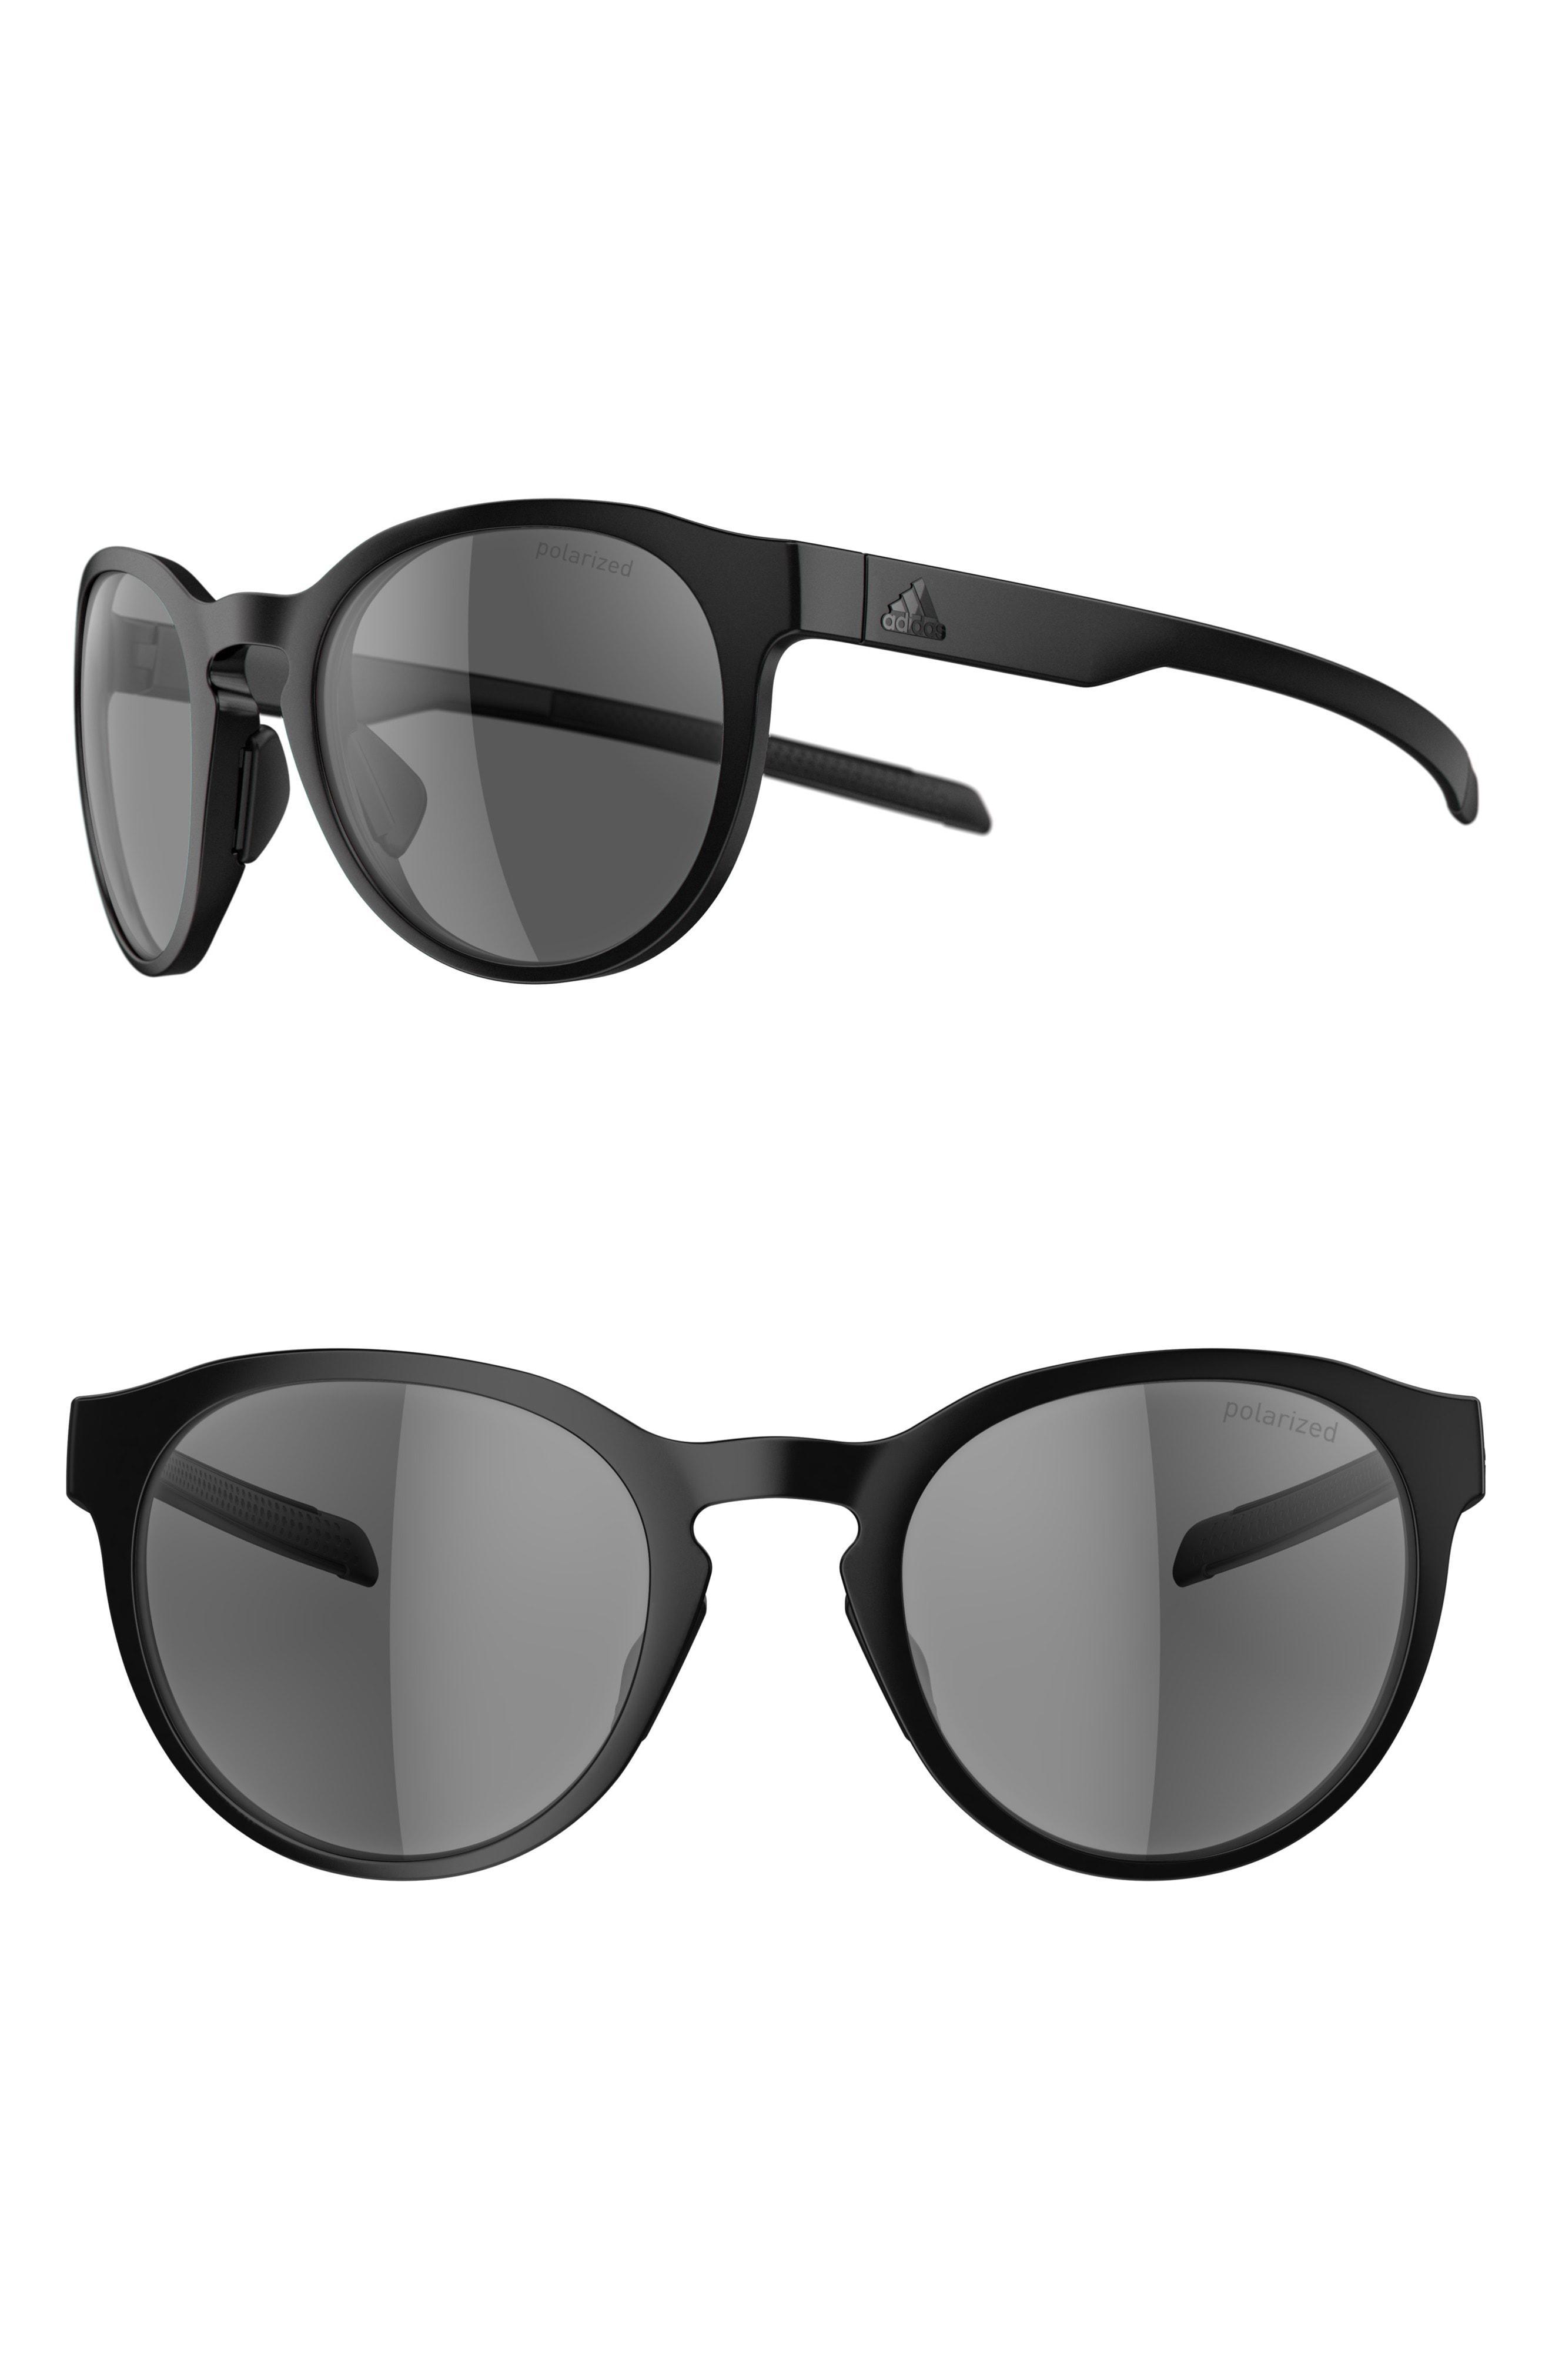 613386bb3b90 adidas. Women s Proshift 52mm Polarized Sport Sunglasses